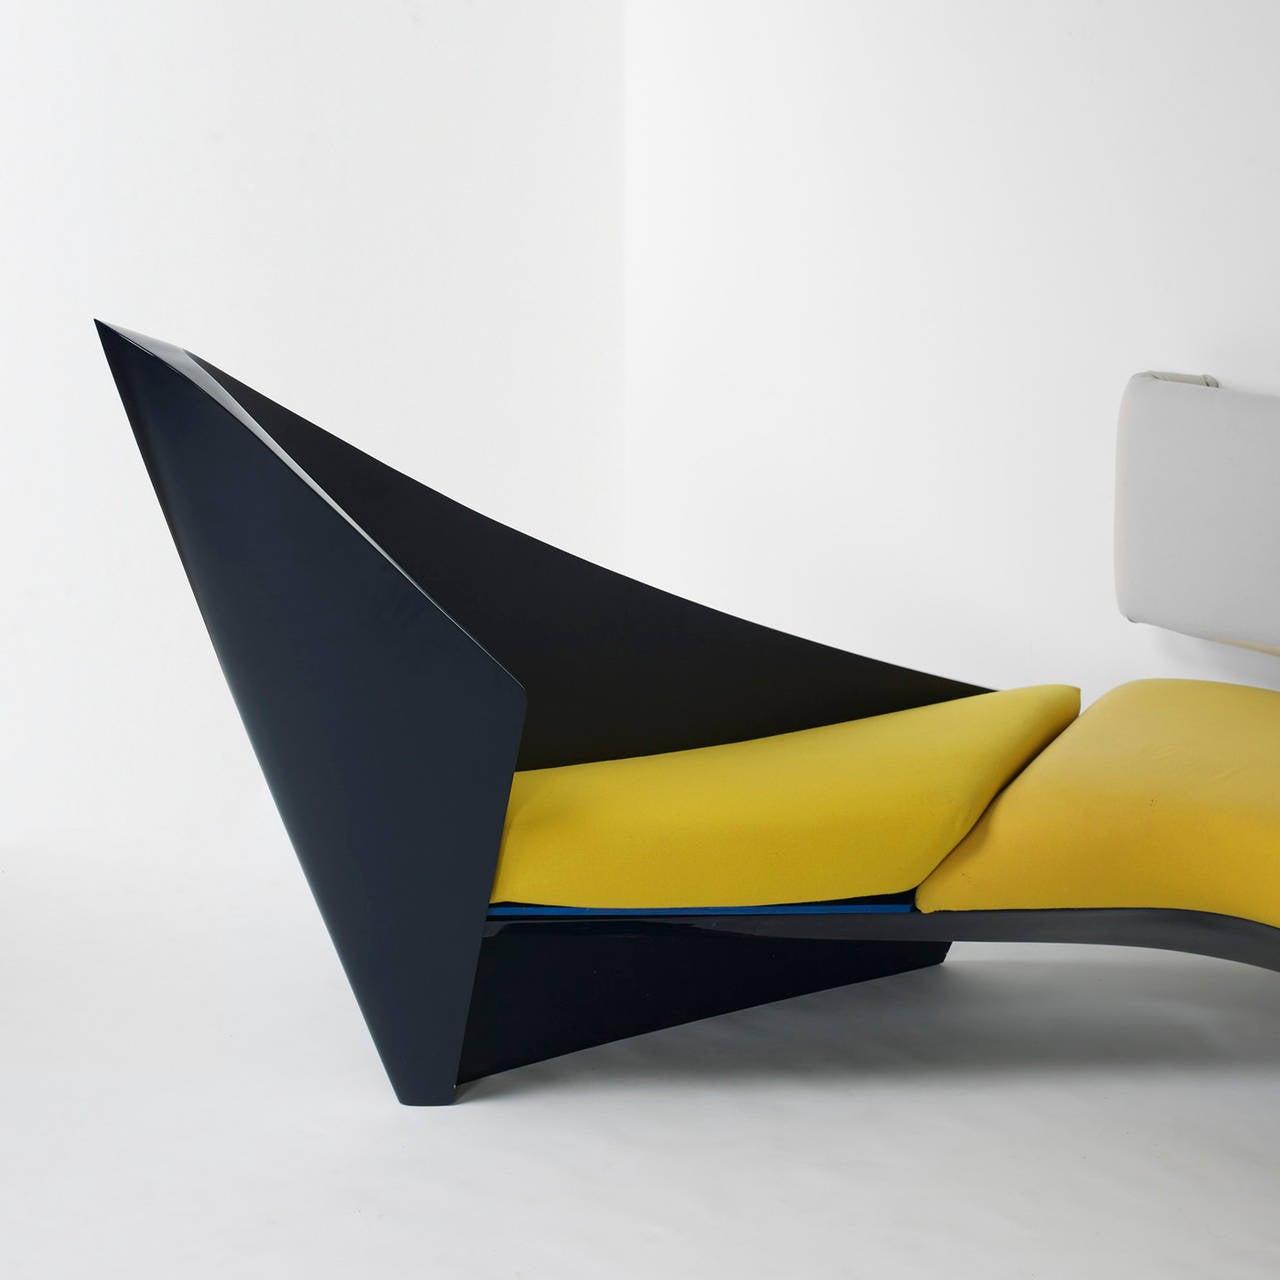 Zaha Hadid Furniture Designs: Wave Sofa By Zaha Hadid For Edra For Sale At 1stdibs